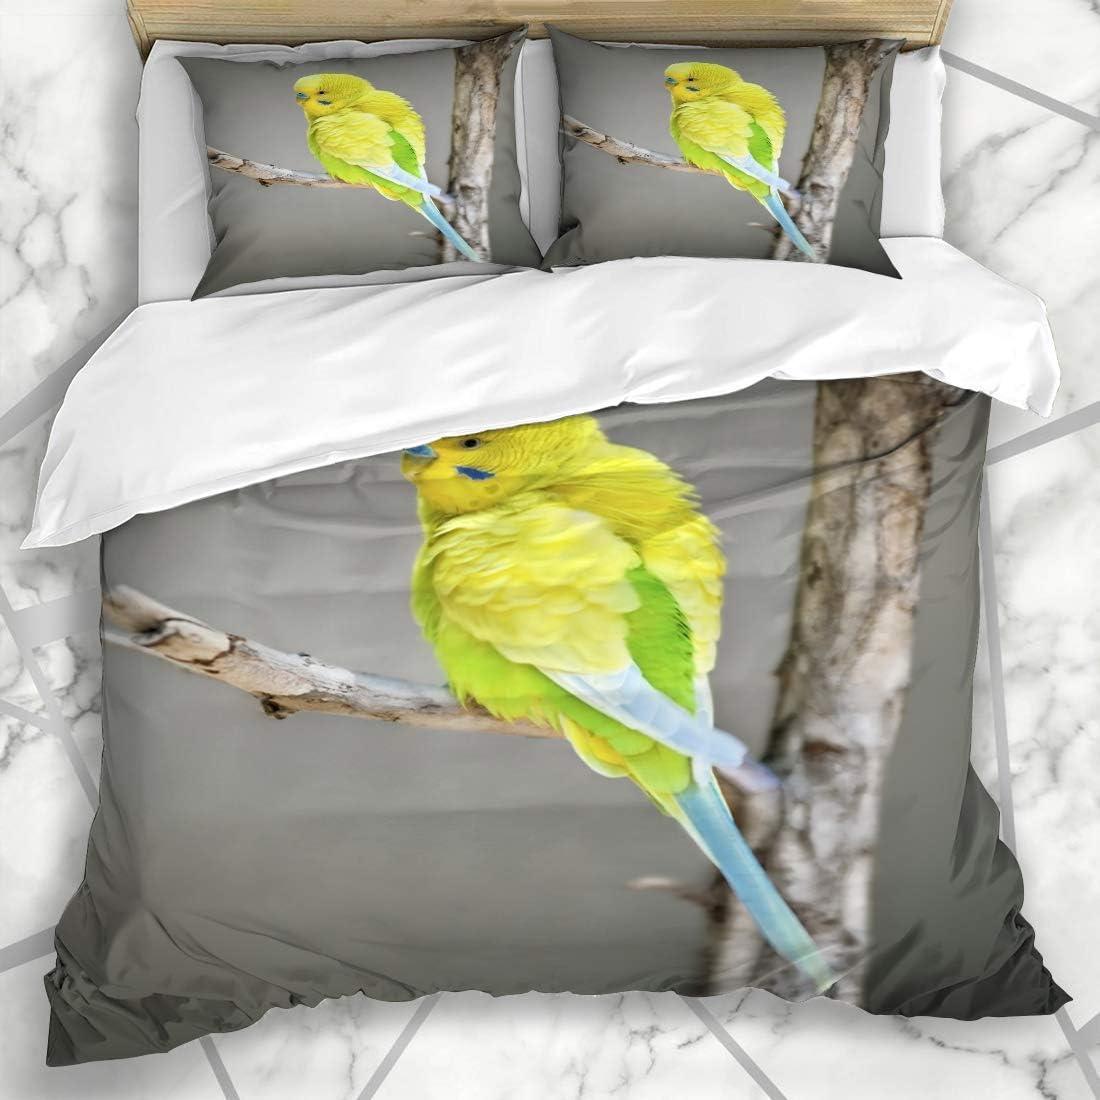 Conjuntos de fundas nórdicas Pico Periquito amarillo australiano en rama Periquito doméstico Naturaleza Diseño aviar Juguetón Ropa de cama de microfibra Super King Size con 2 Fundas de almohada Cuidad